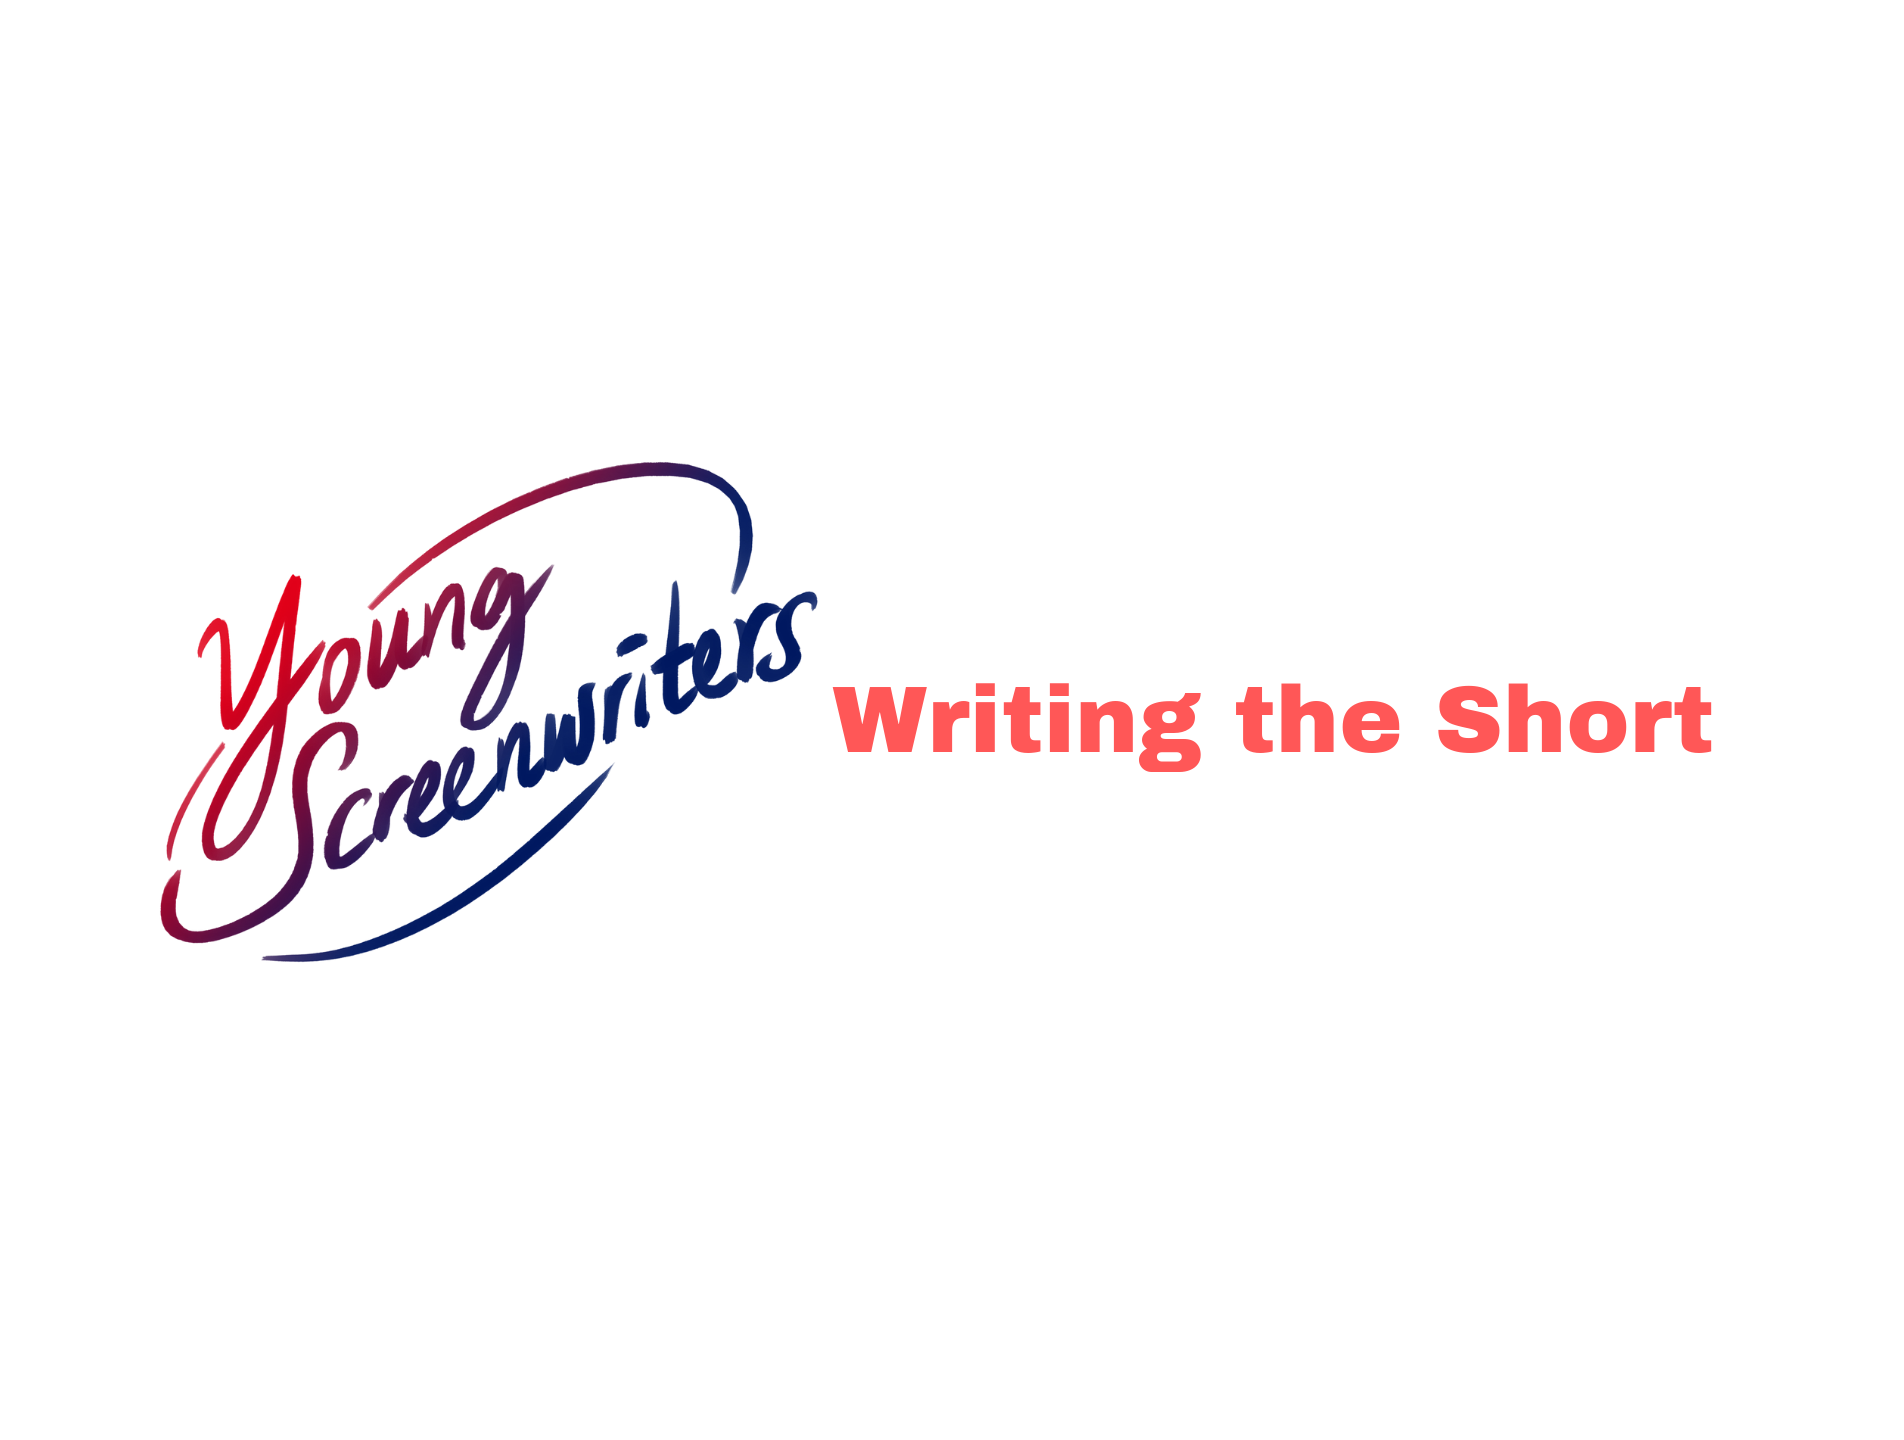 youngscreenwriters.teachable.com